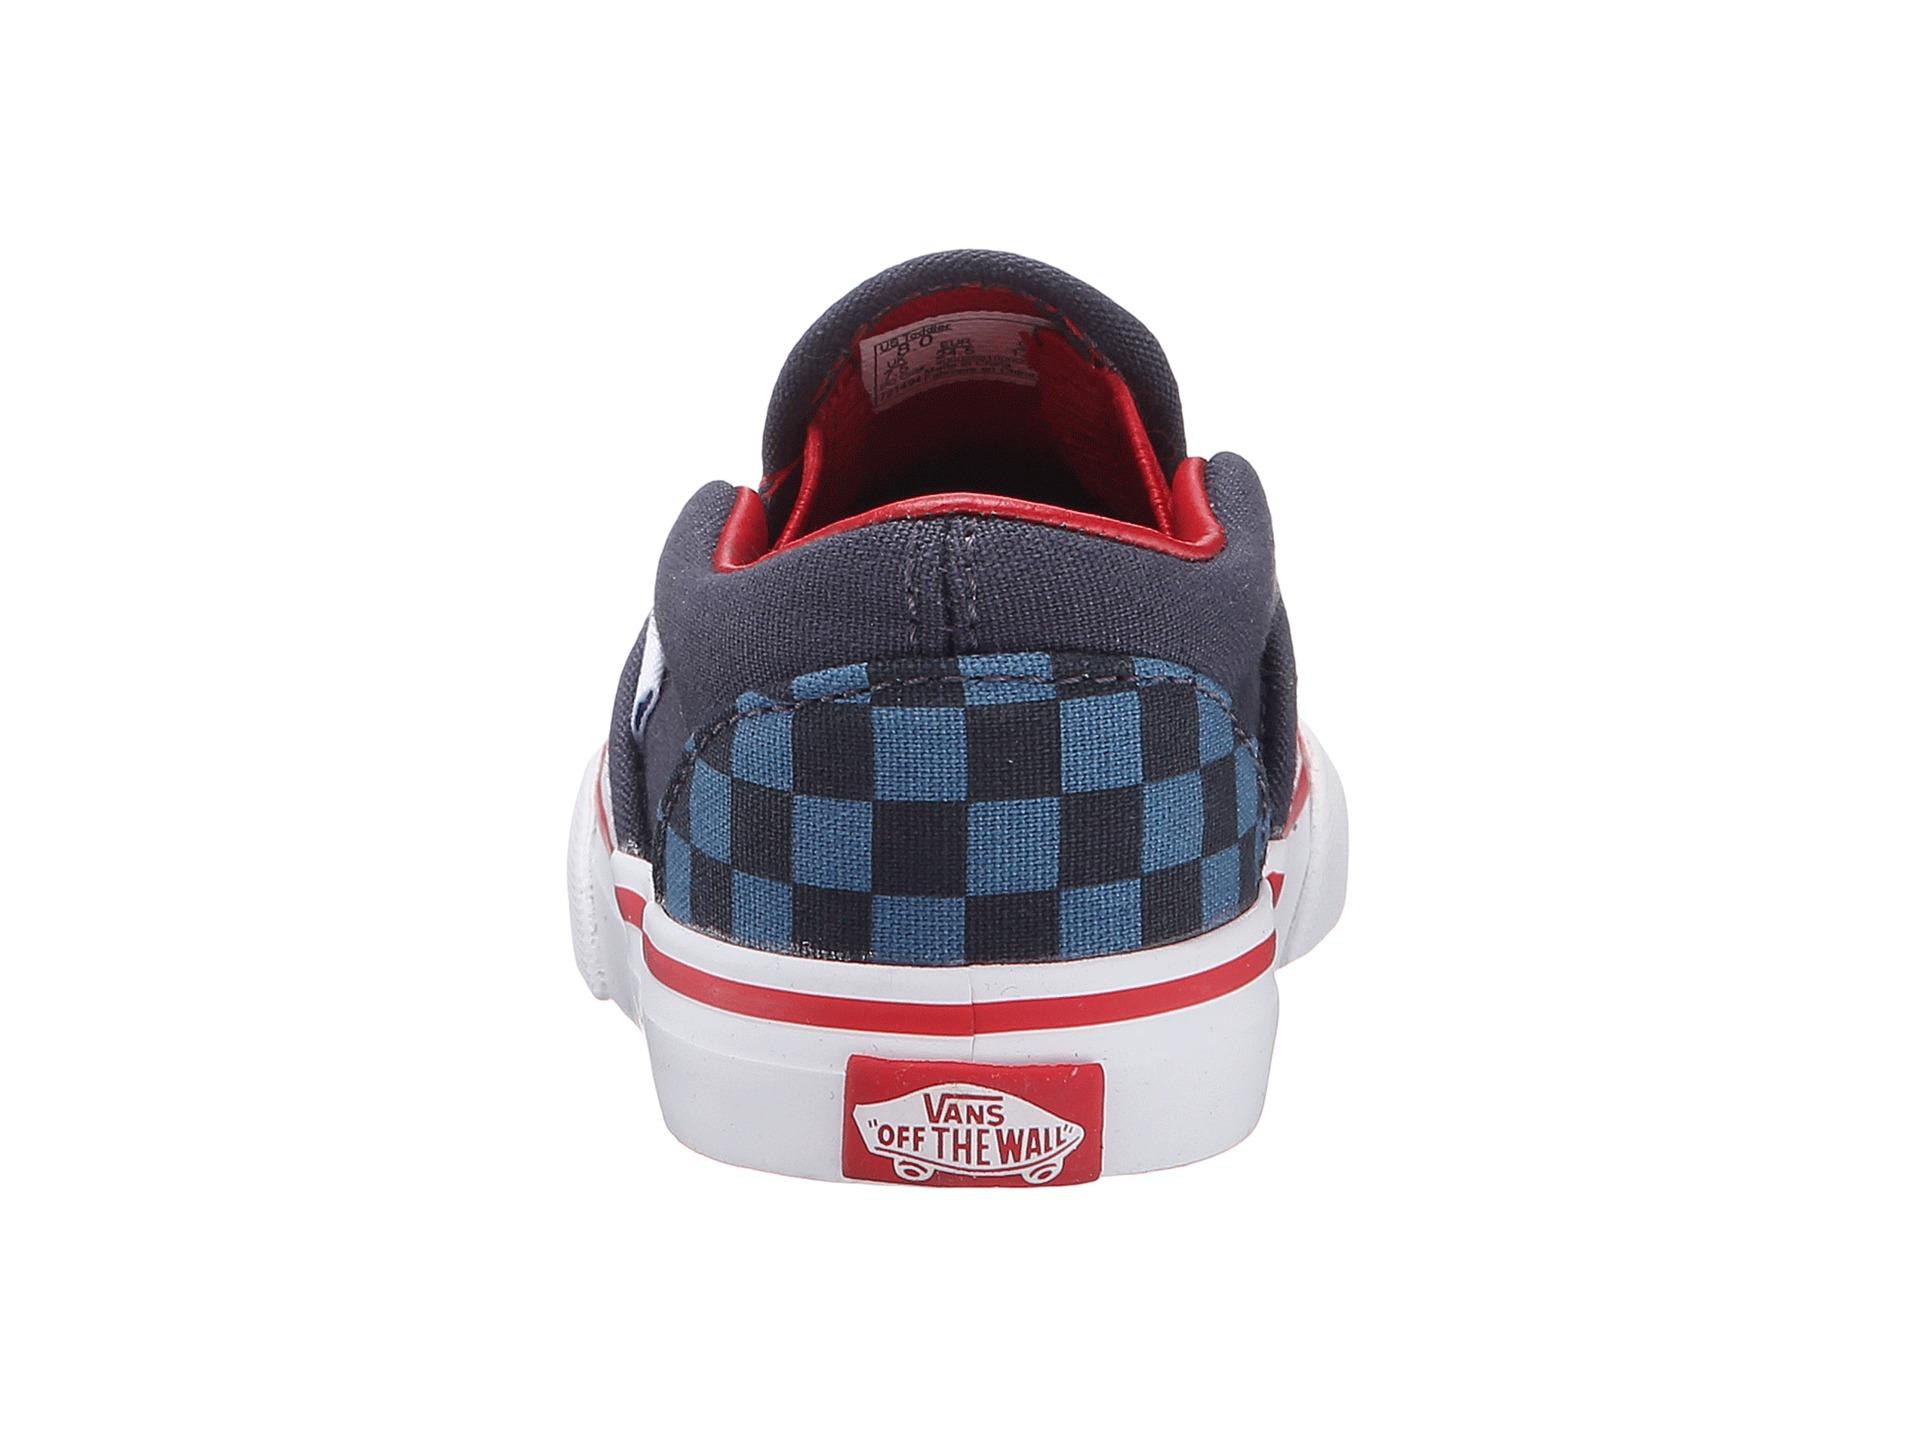 Vans Walking Shoes Zappos